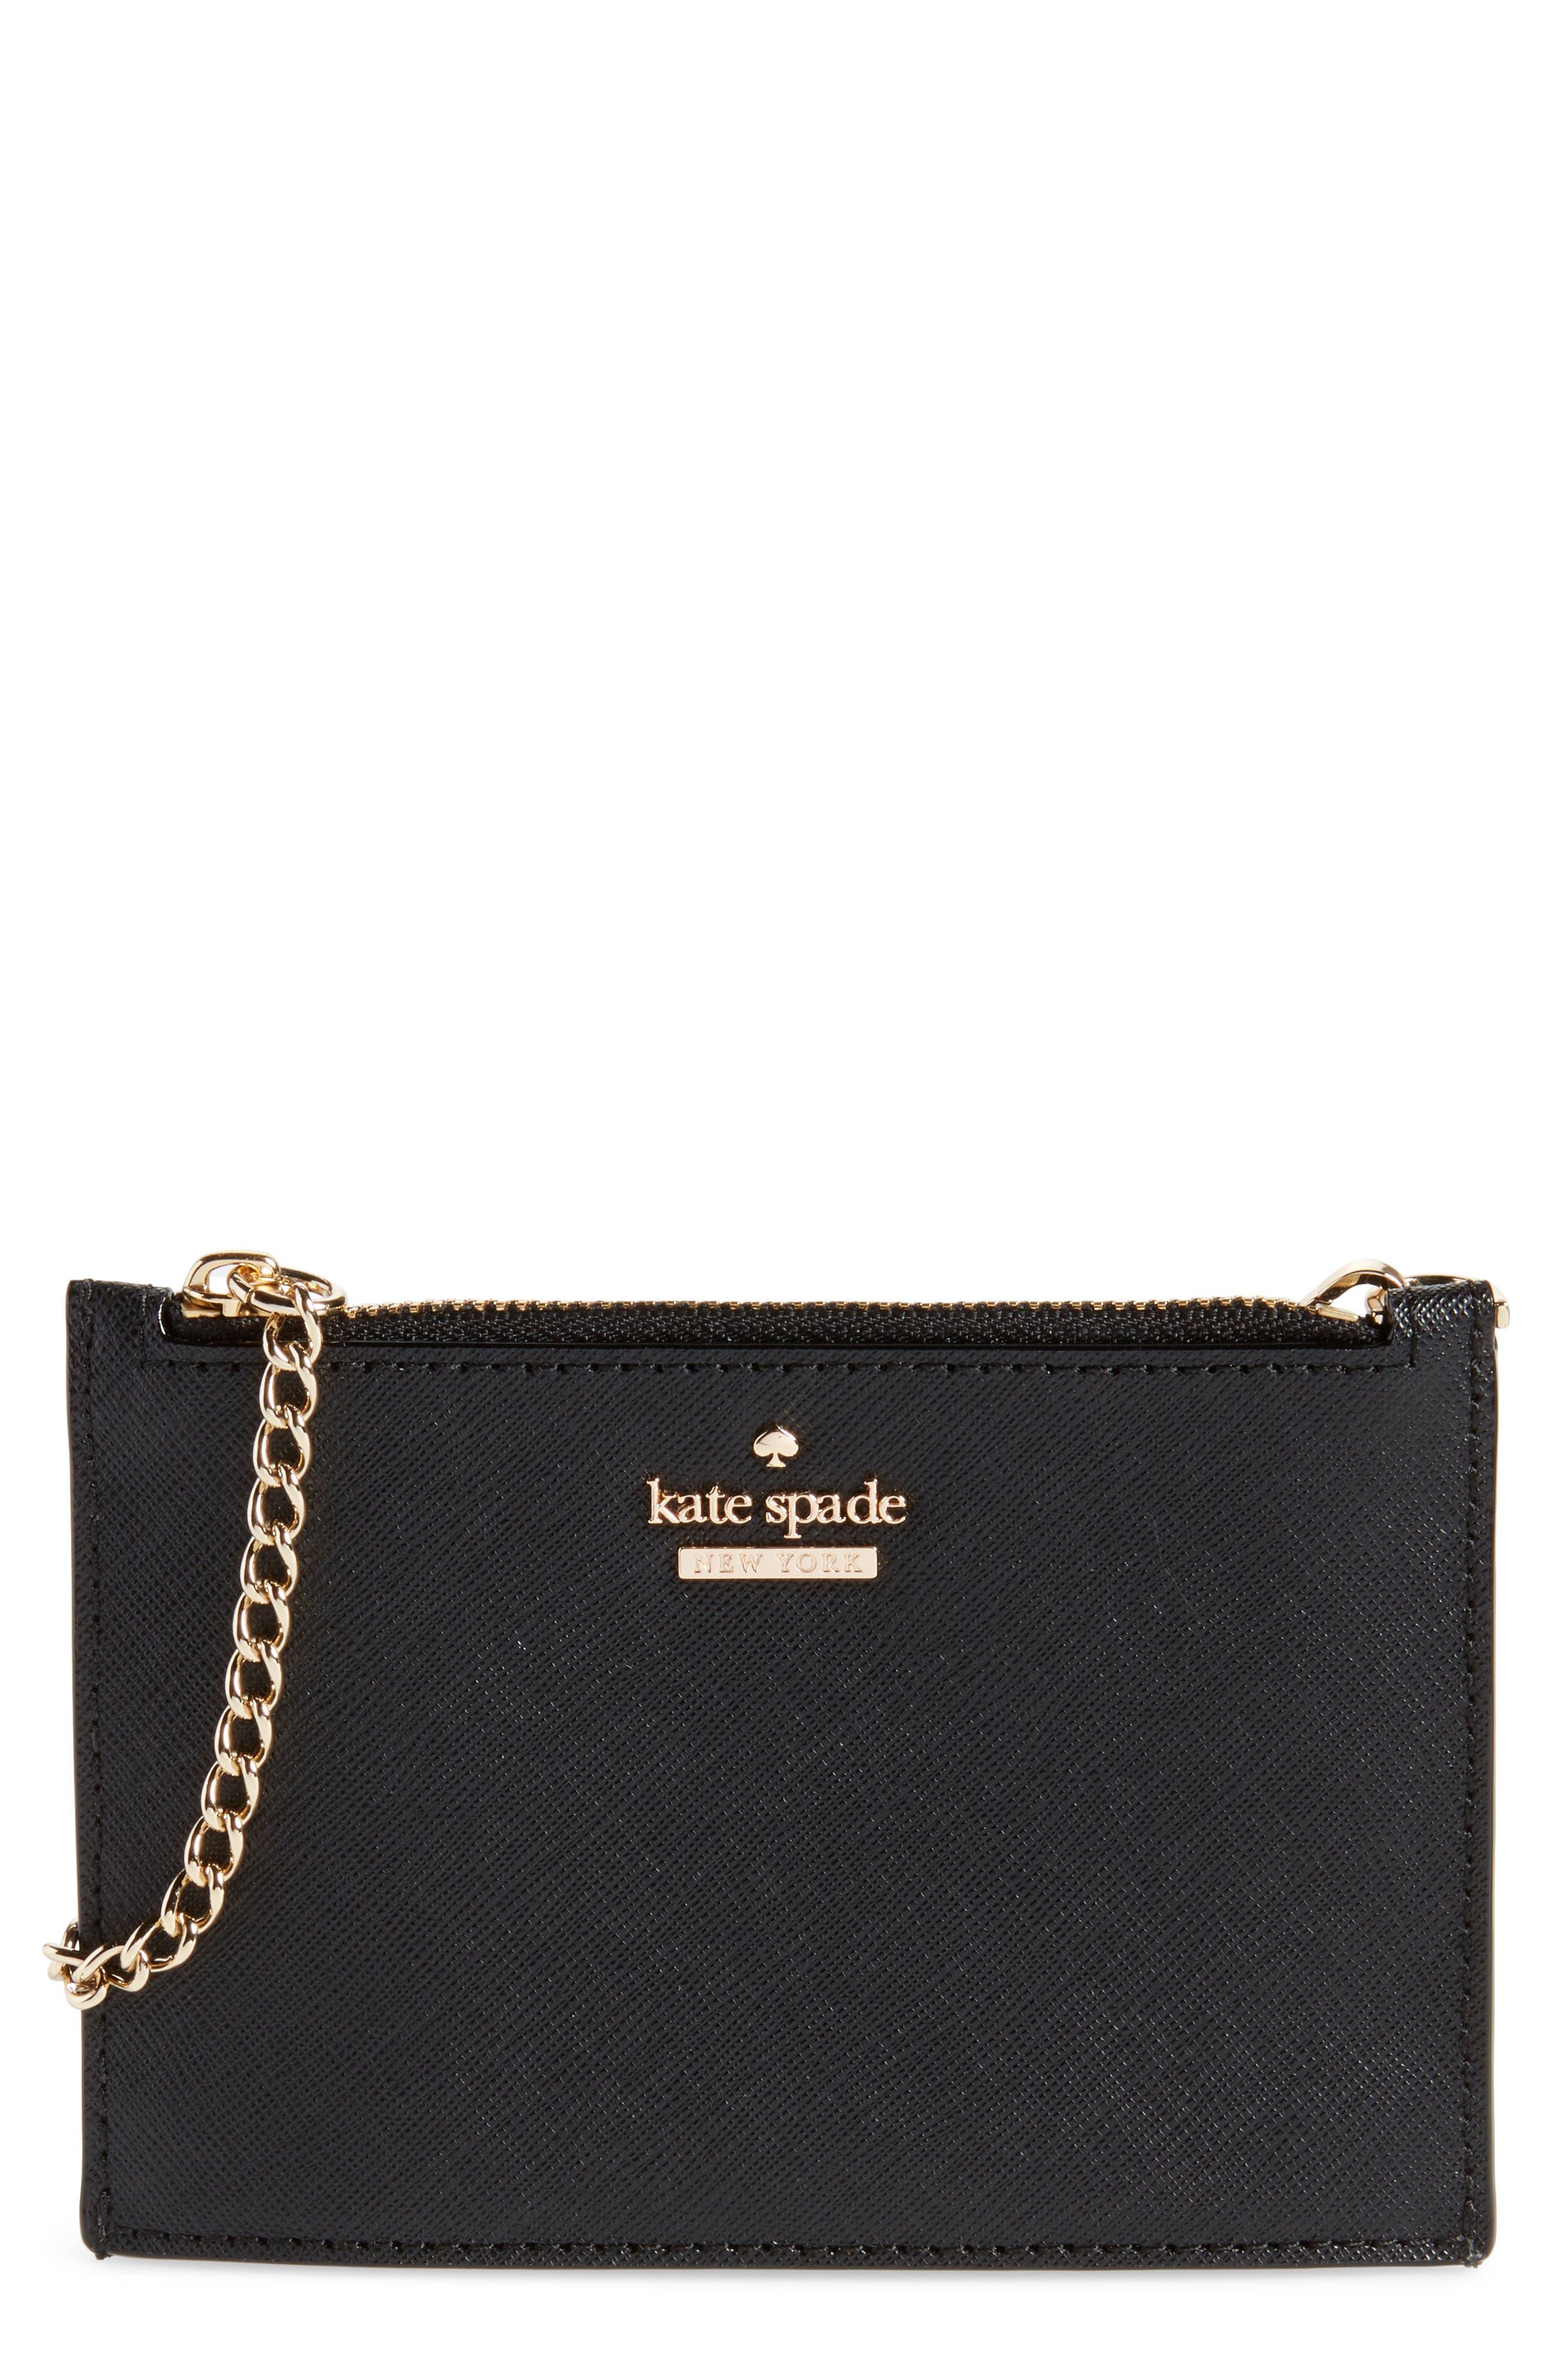 cameron street caroline leather zip pouch,                         Main,                         color, 001